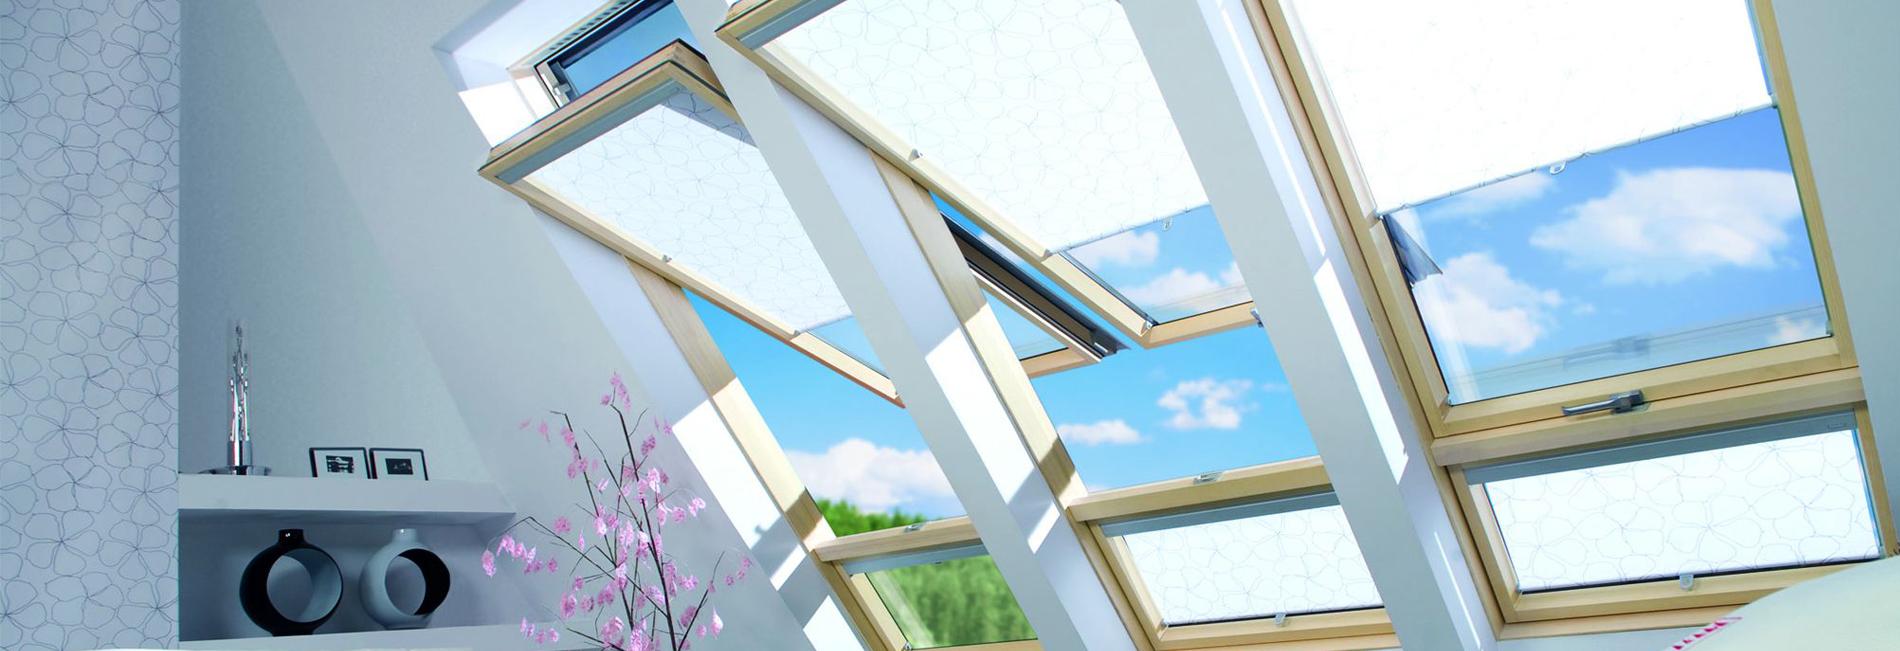 okna-dachowe-sliders3